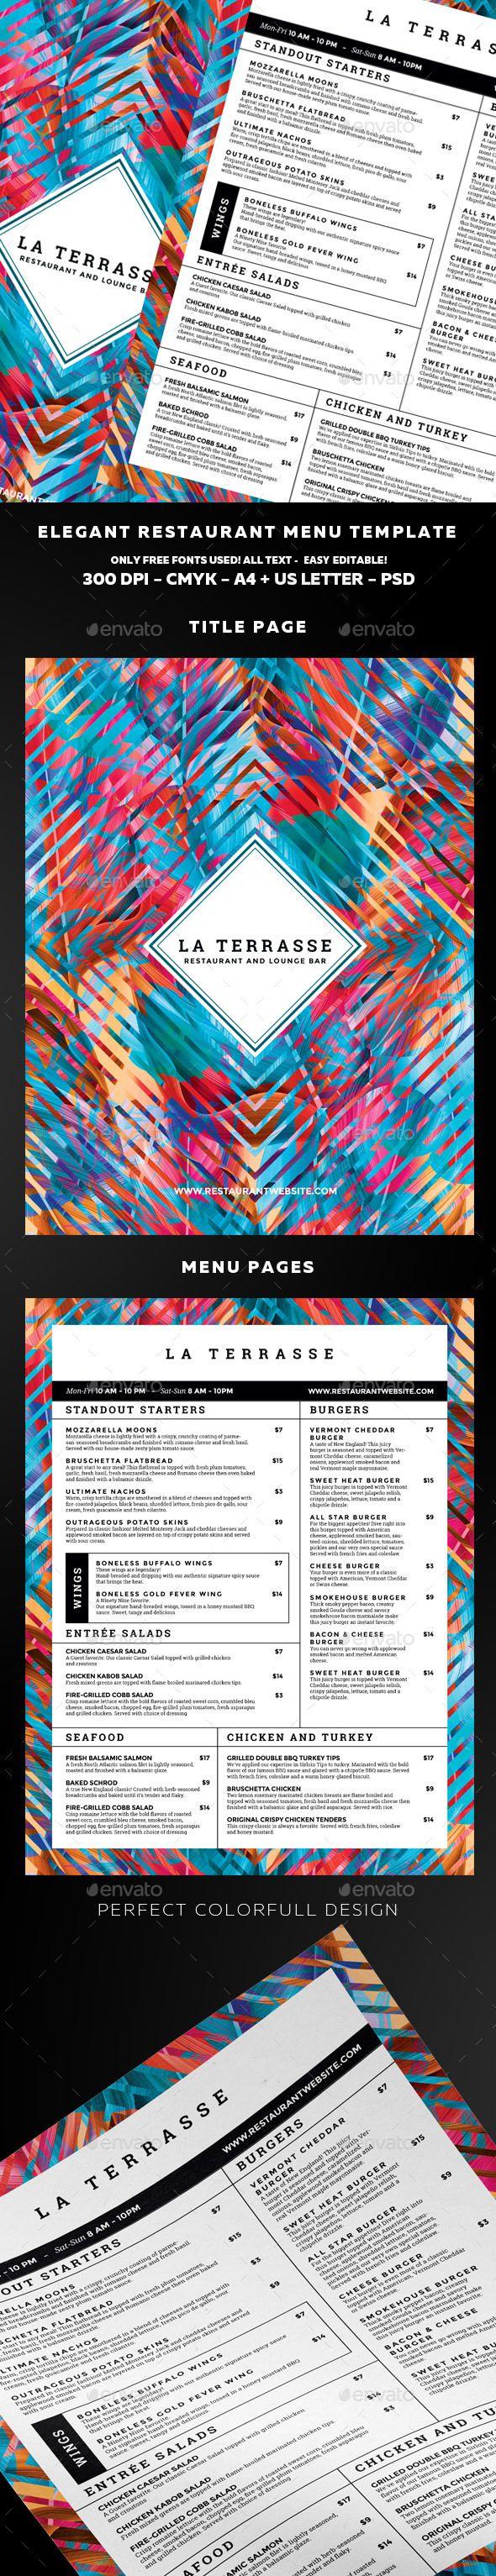 Restaurant Menu With Txt File C